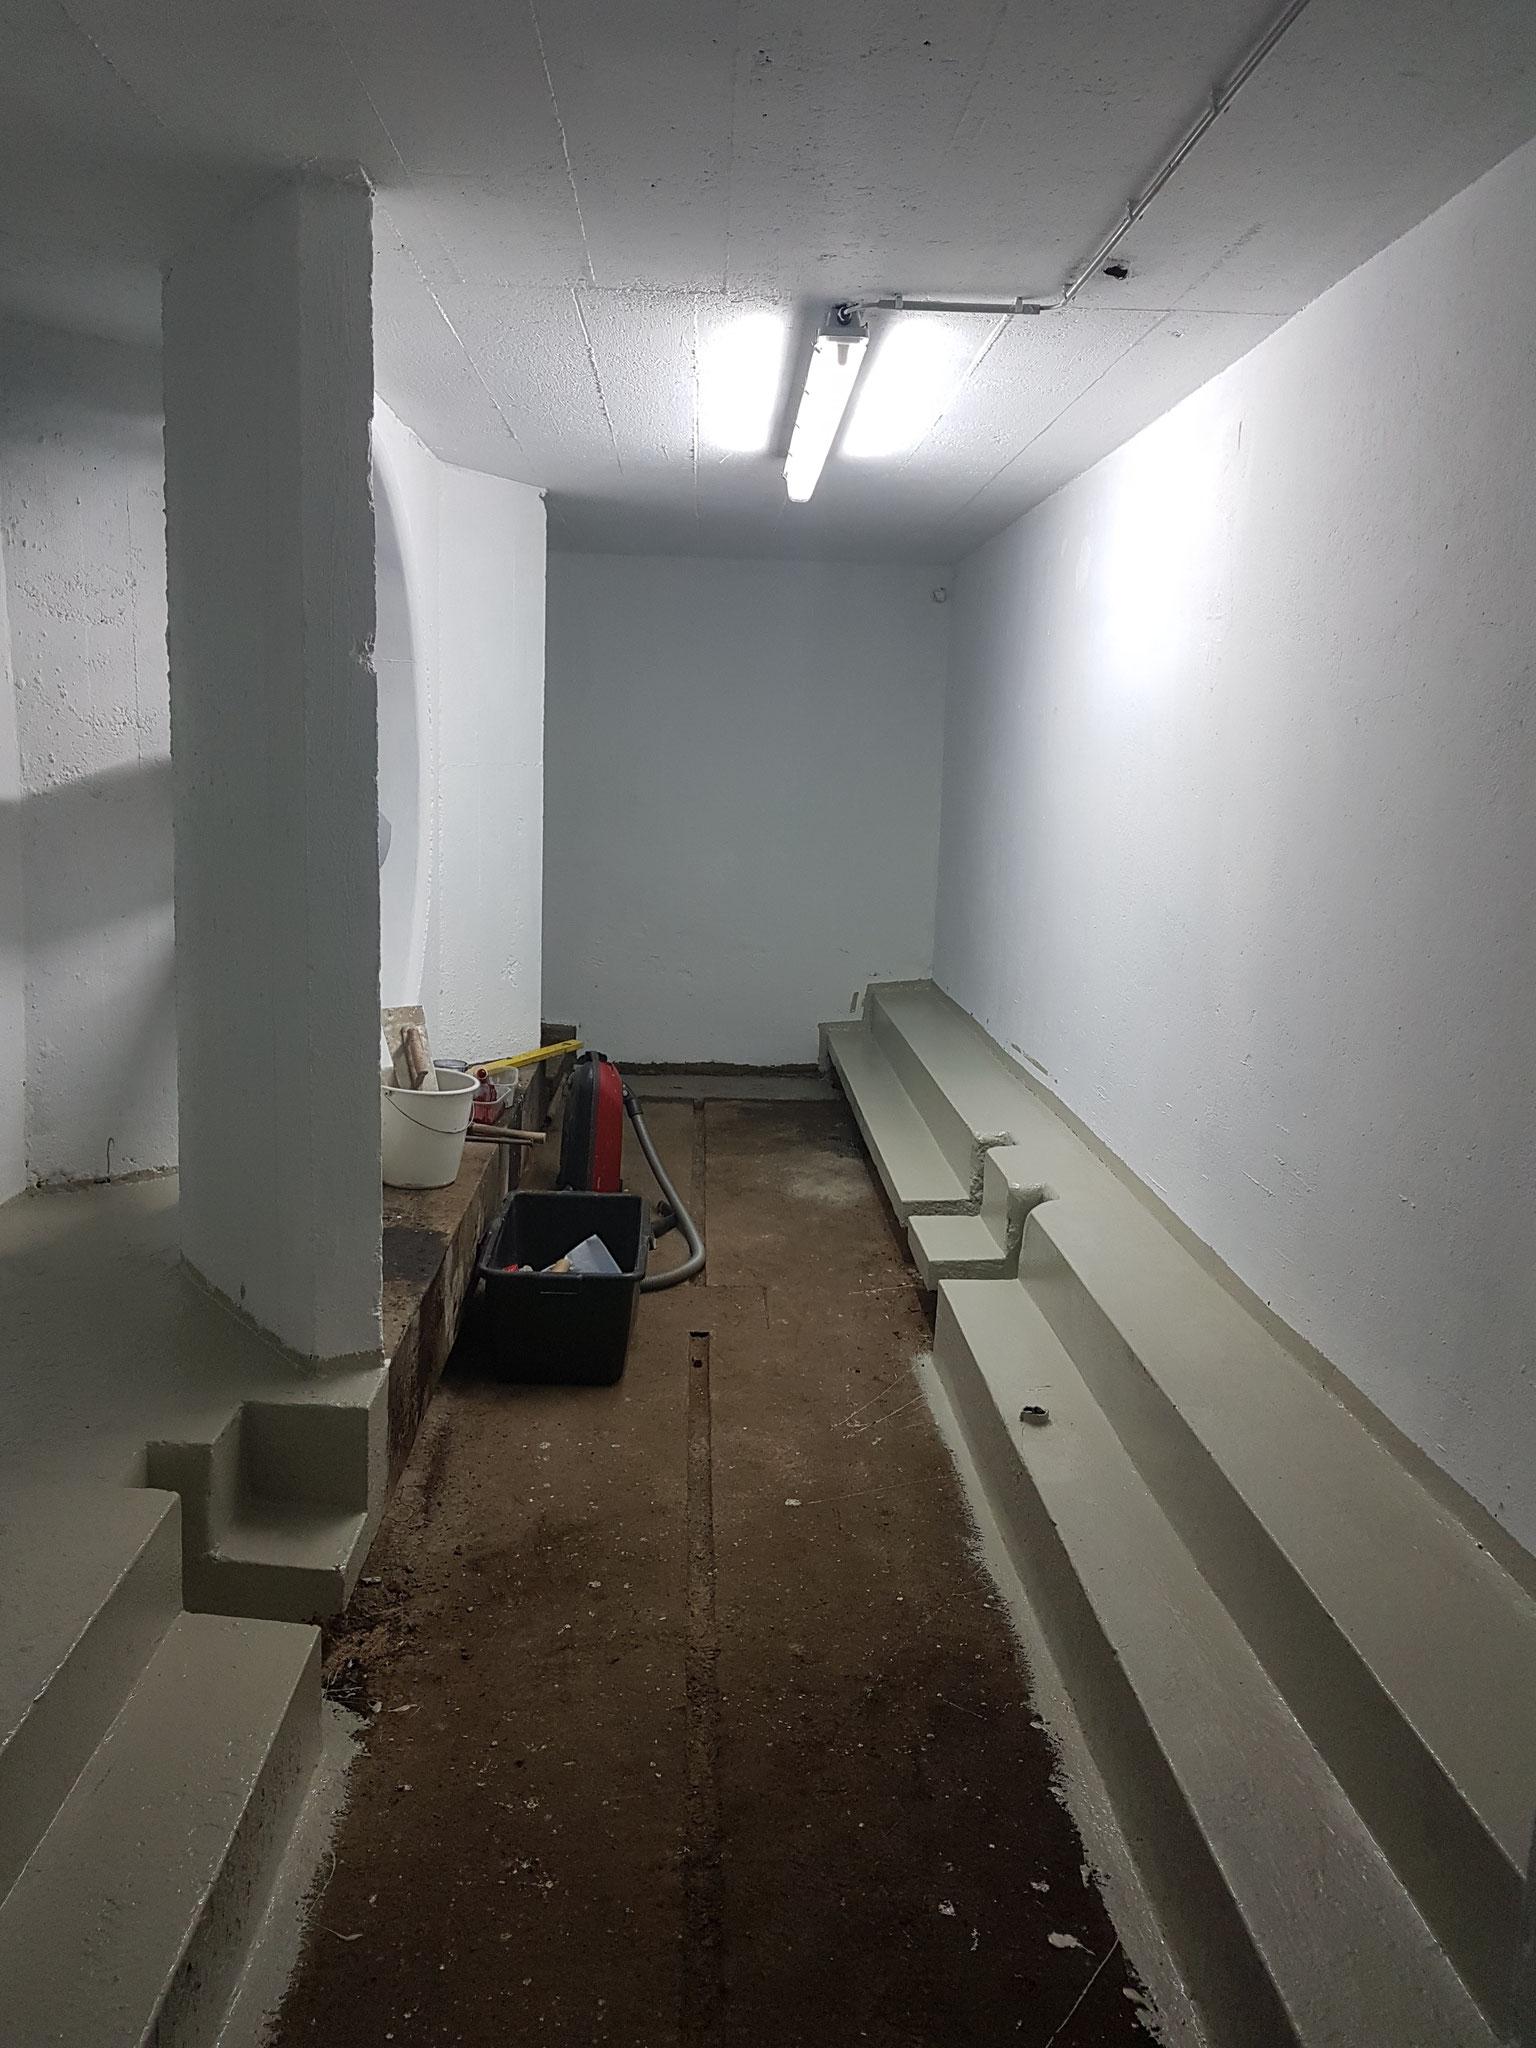 04.09.2018 Sanierung Boden